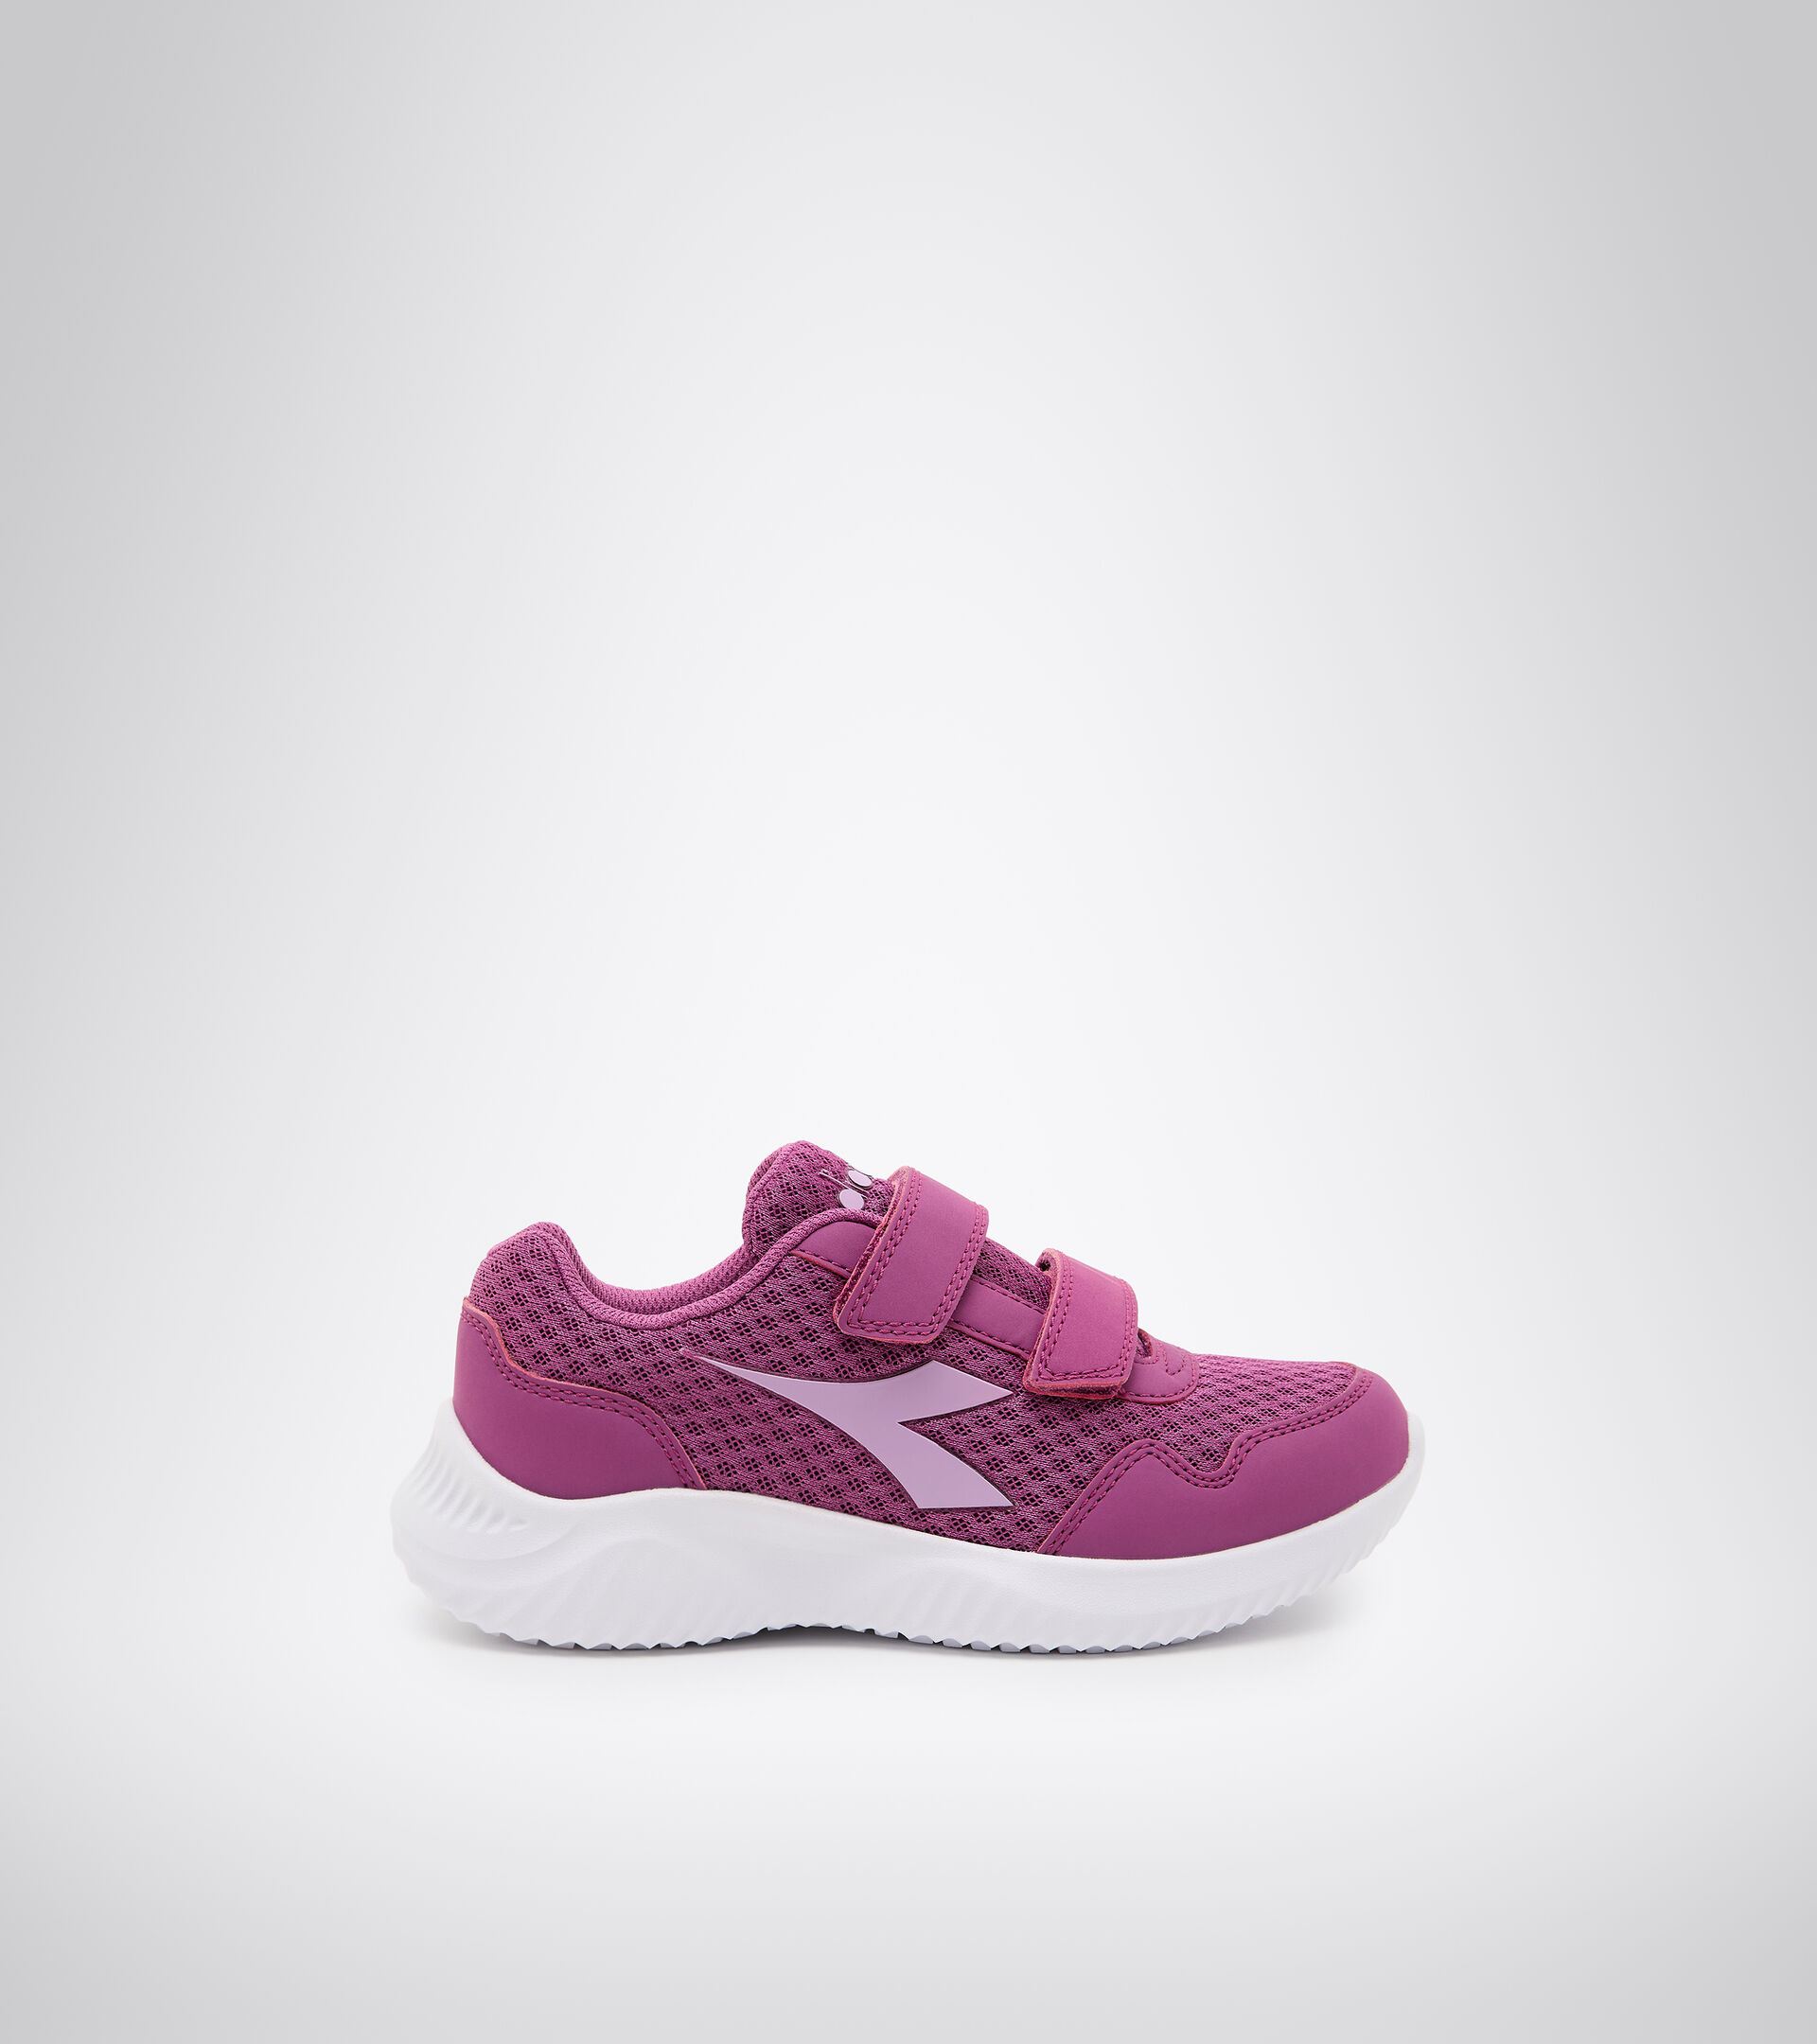 Footwear Sport BAMBINO ROBIN 2 JR V VIOLETA BRILLANTE/TUL VIOLETA Diadora